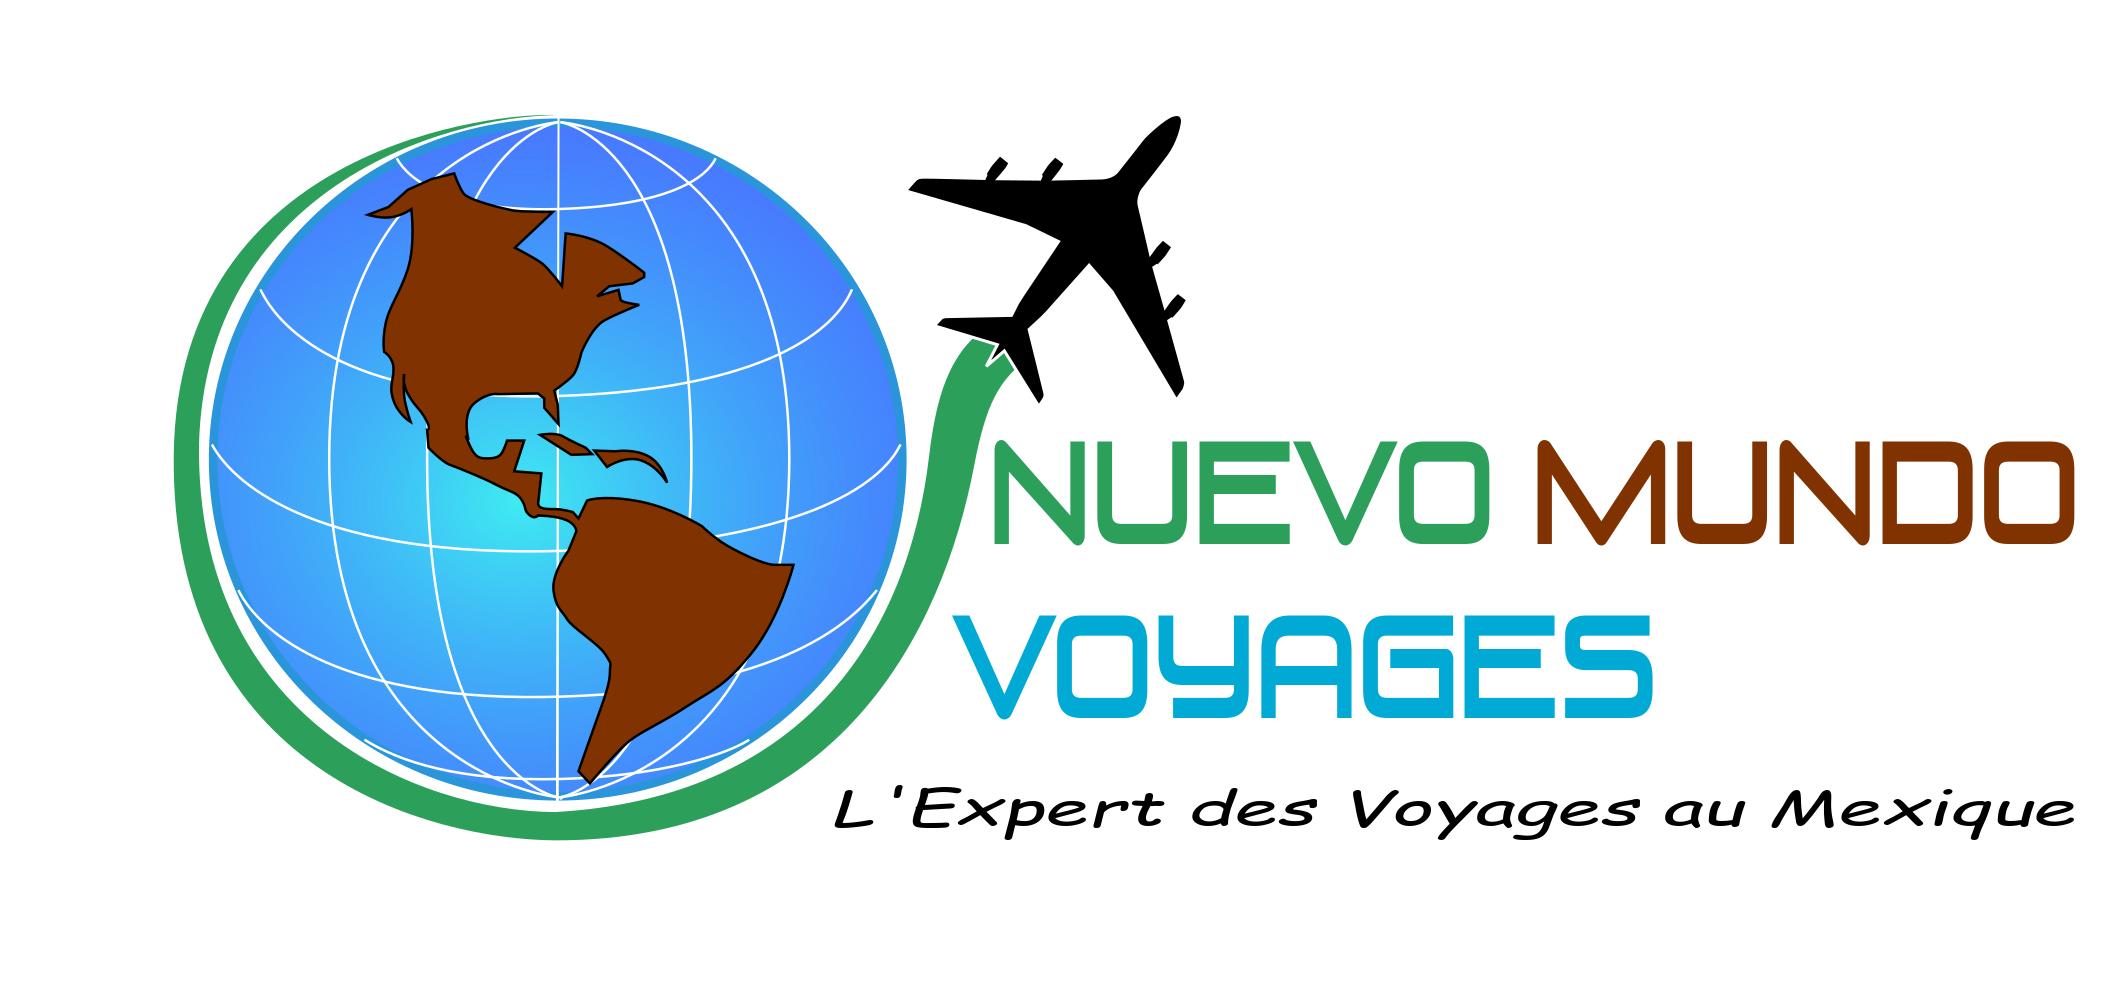 Nuevo Mundo Voyages : une alliance franco-mexicaine !